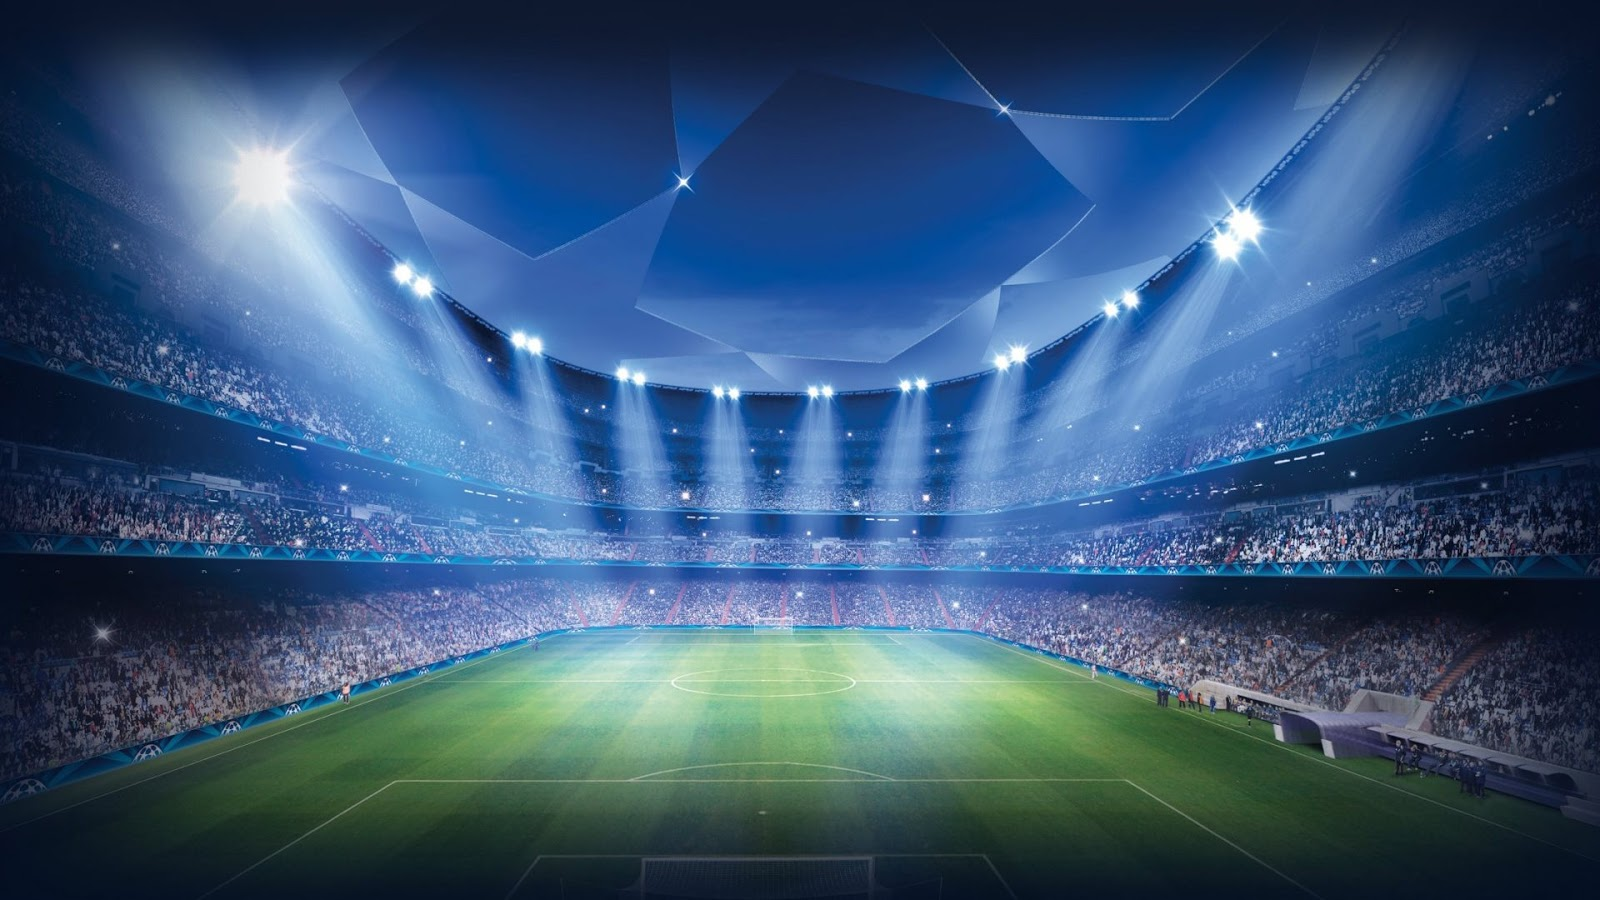 Football Wallpaper 4k: Latest 4K Ultra High Definition Wallpapers: Football 4K